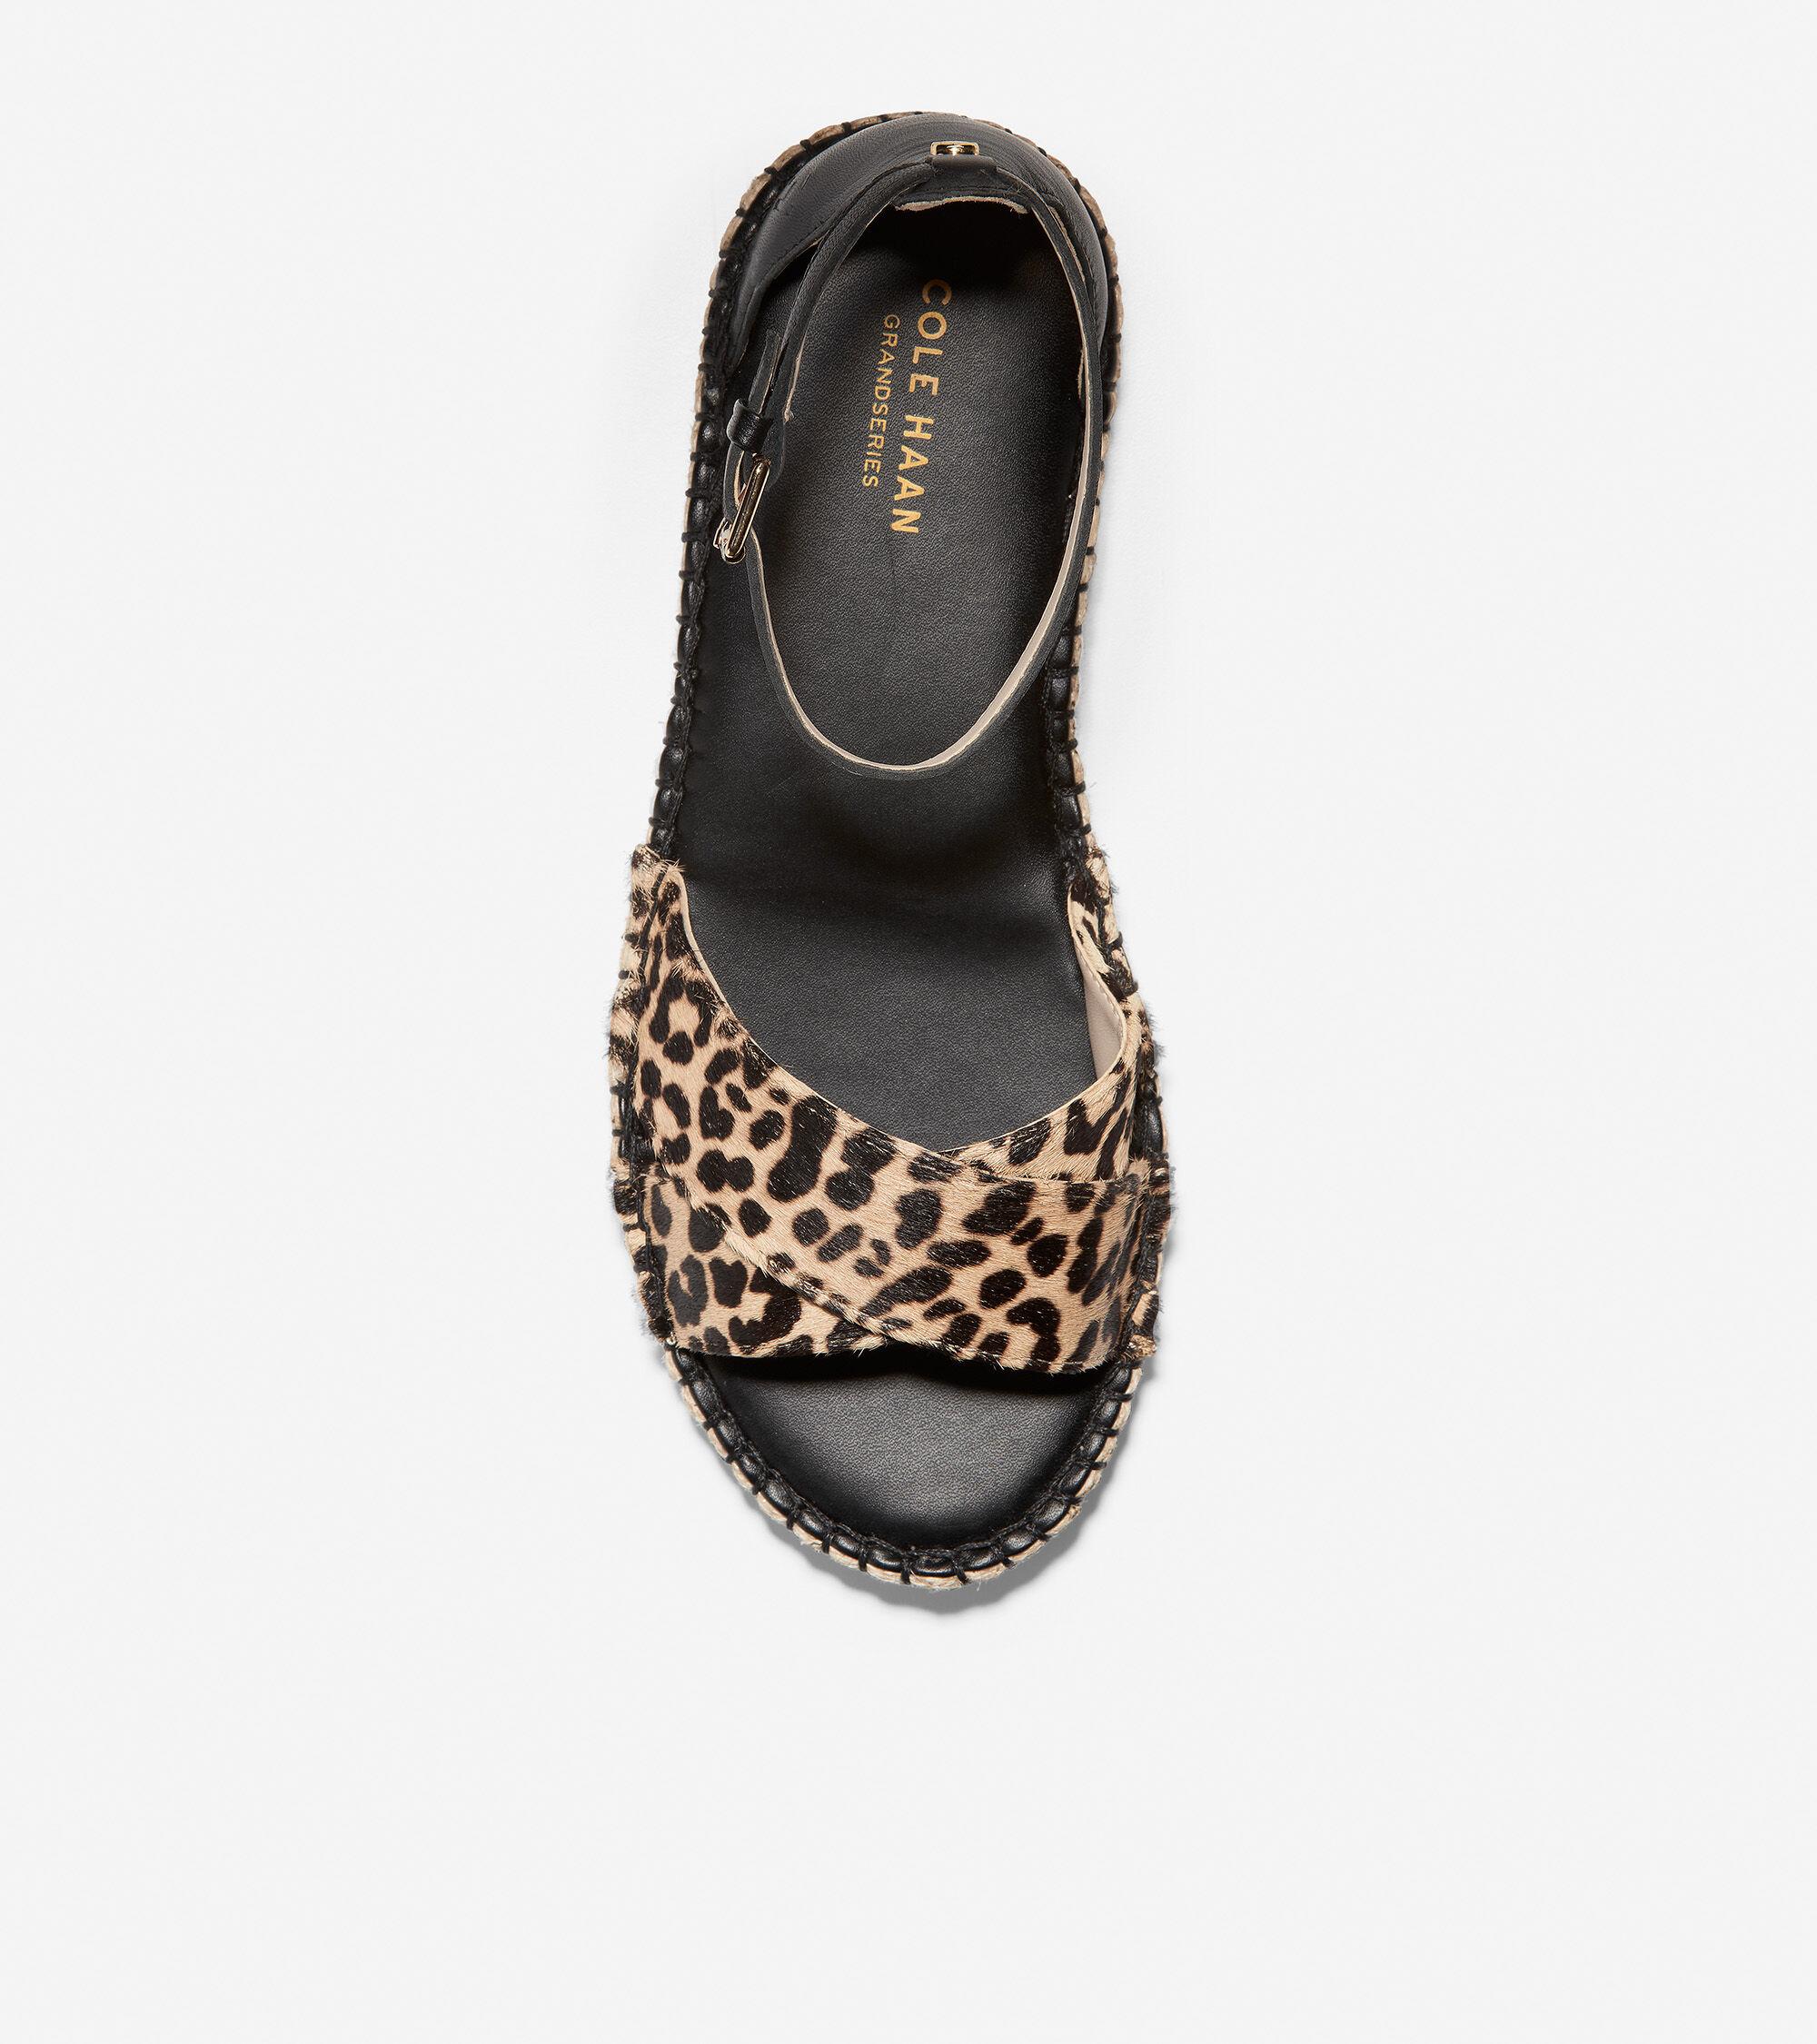 Cloudfeel Espadrille Ankle Strap Sandal